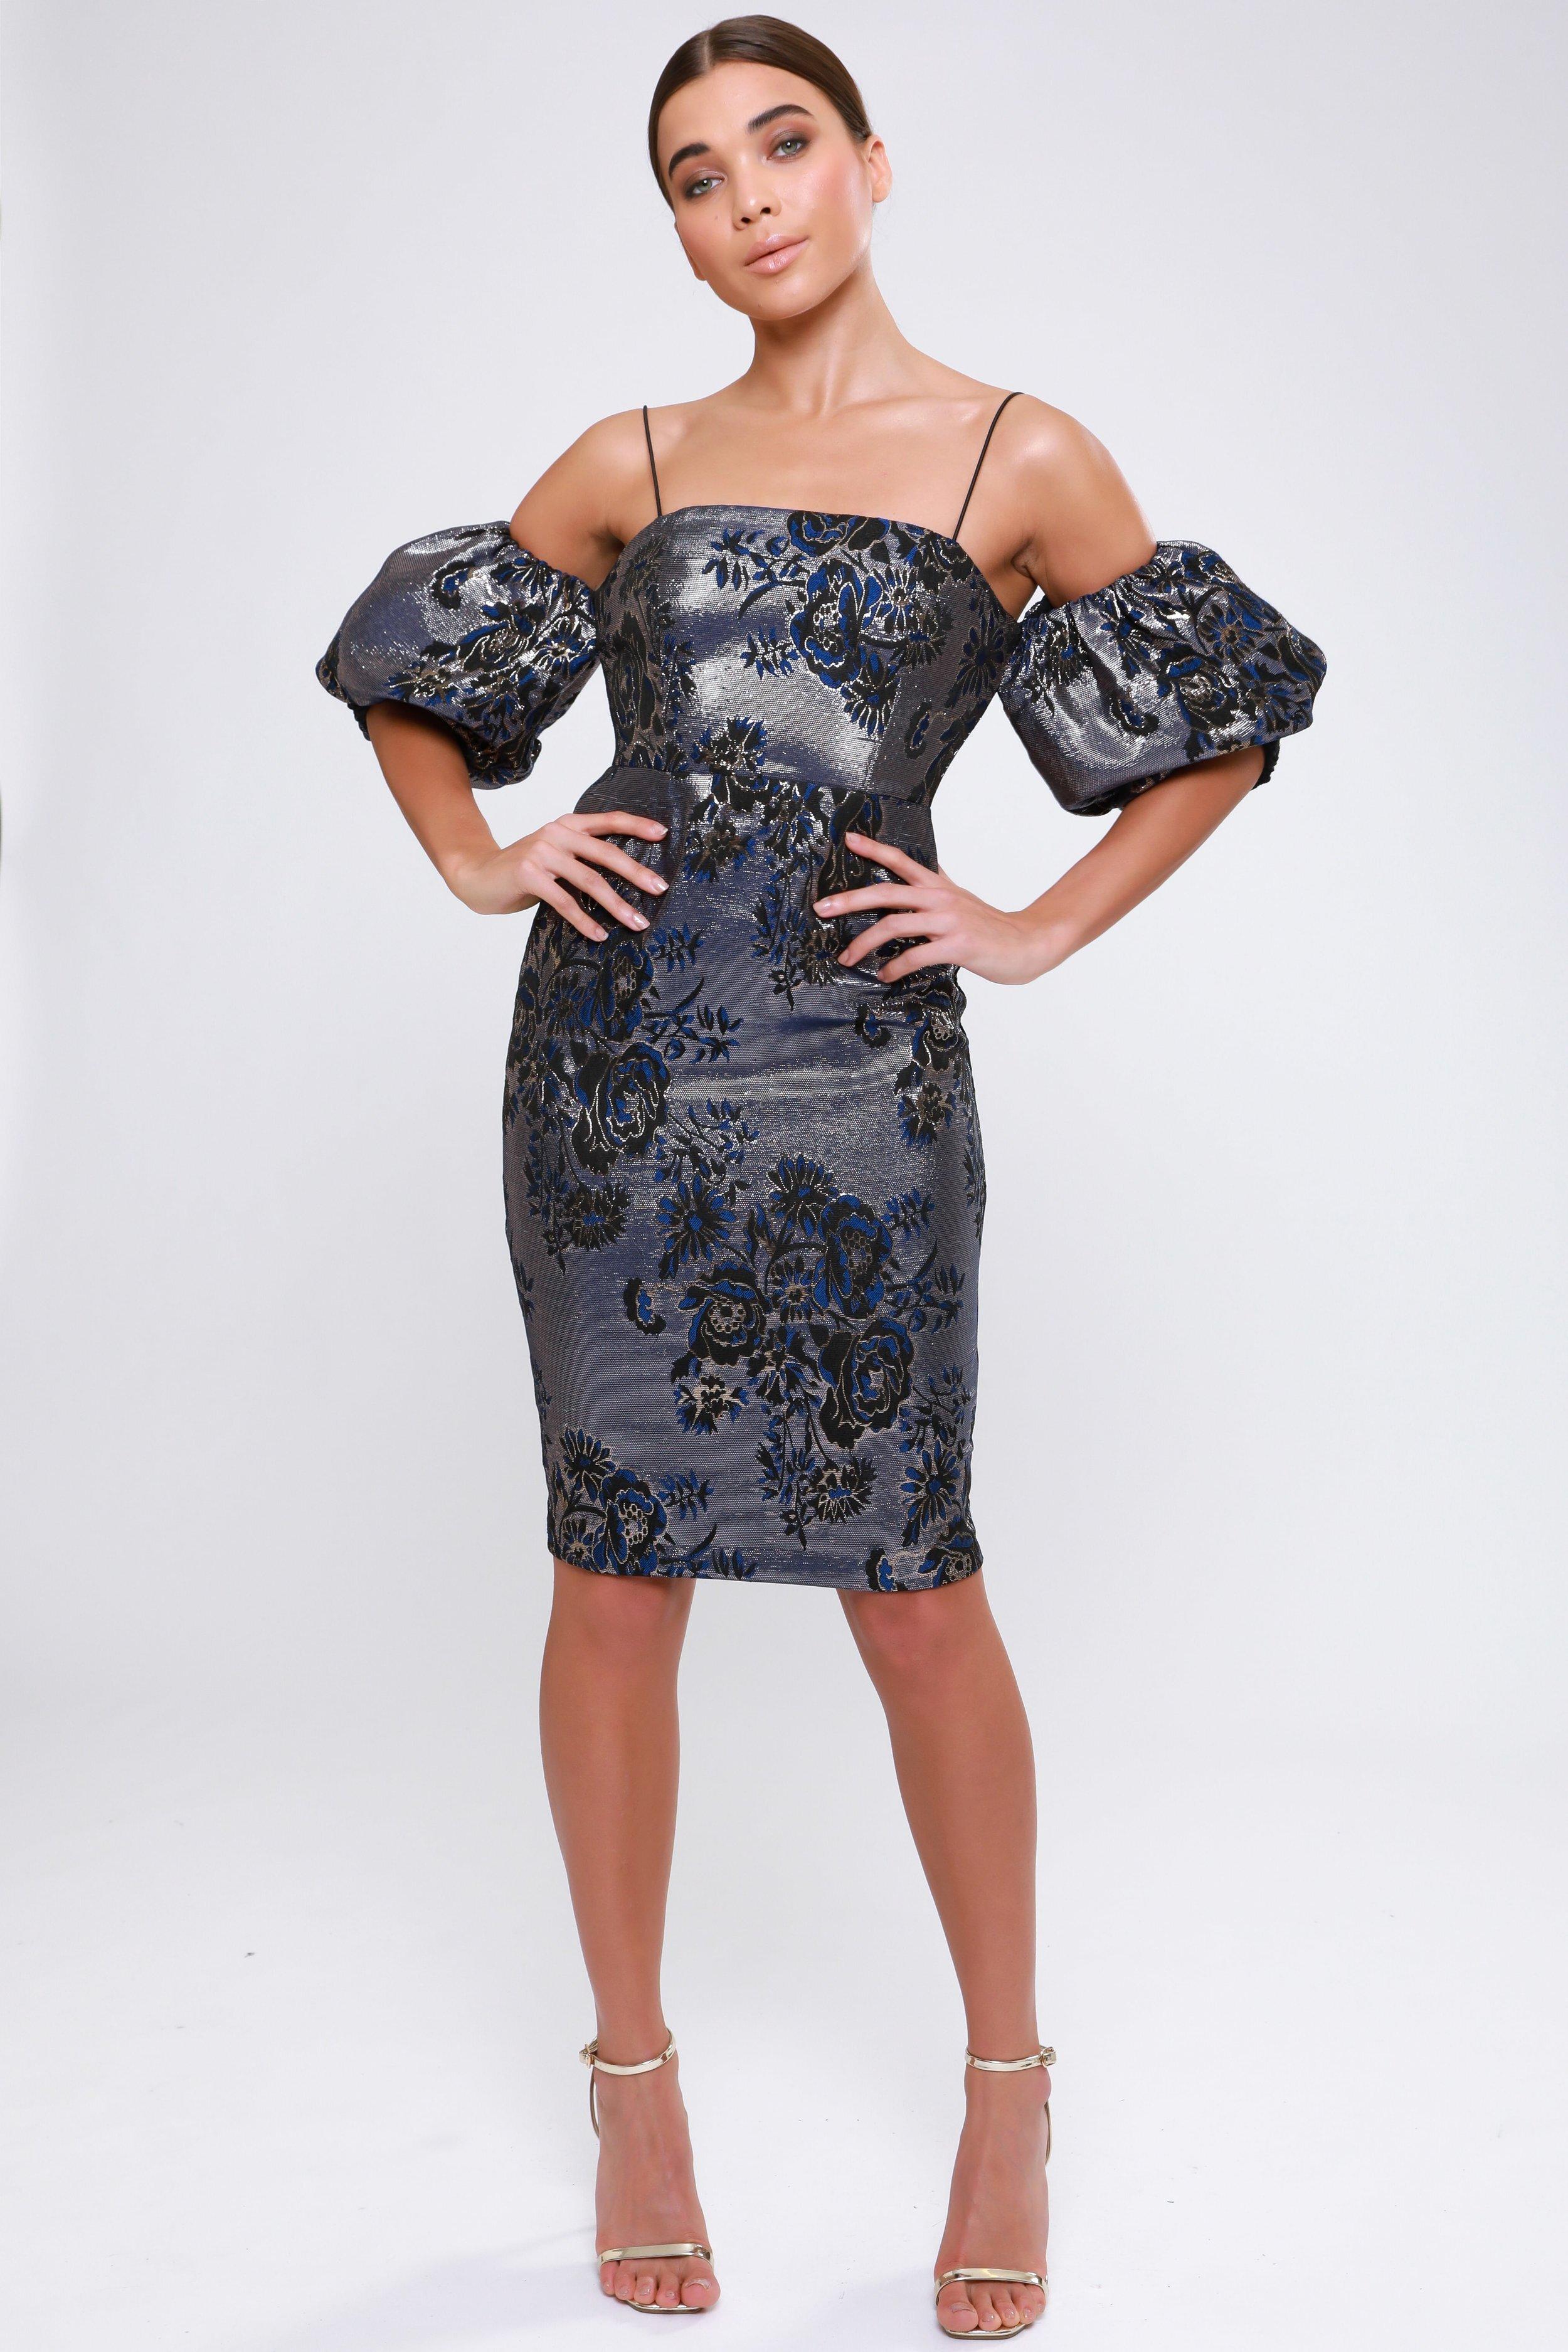 Metallic Jacquard  Puff Sleeve Midi Dress   £75.00